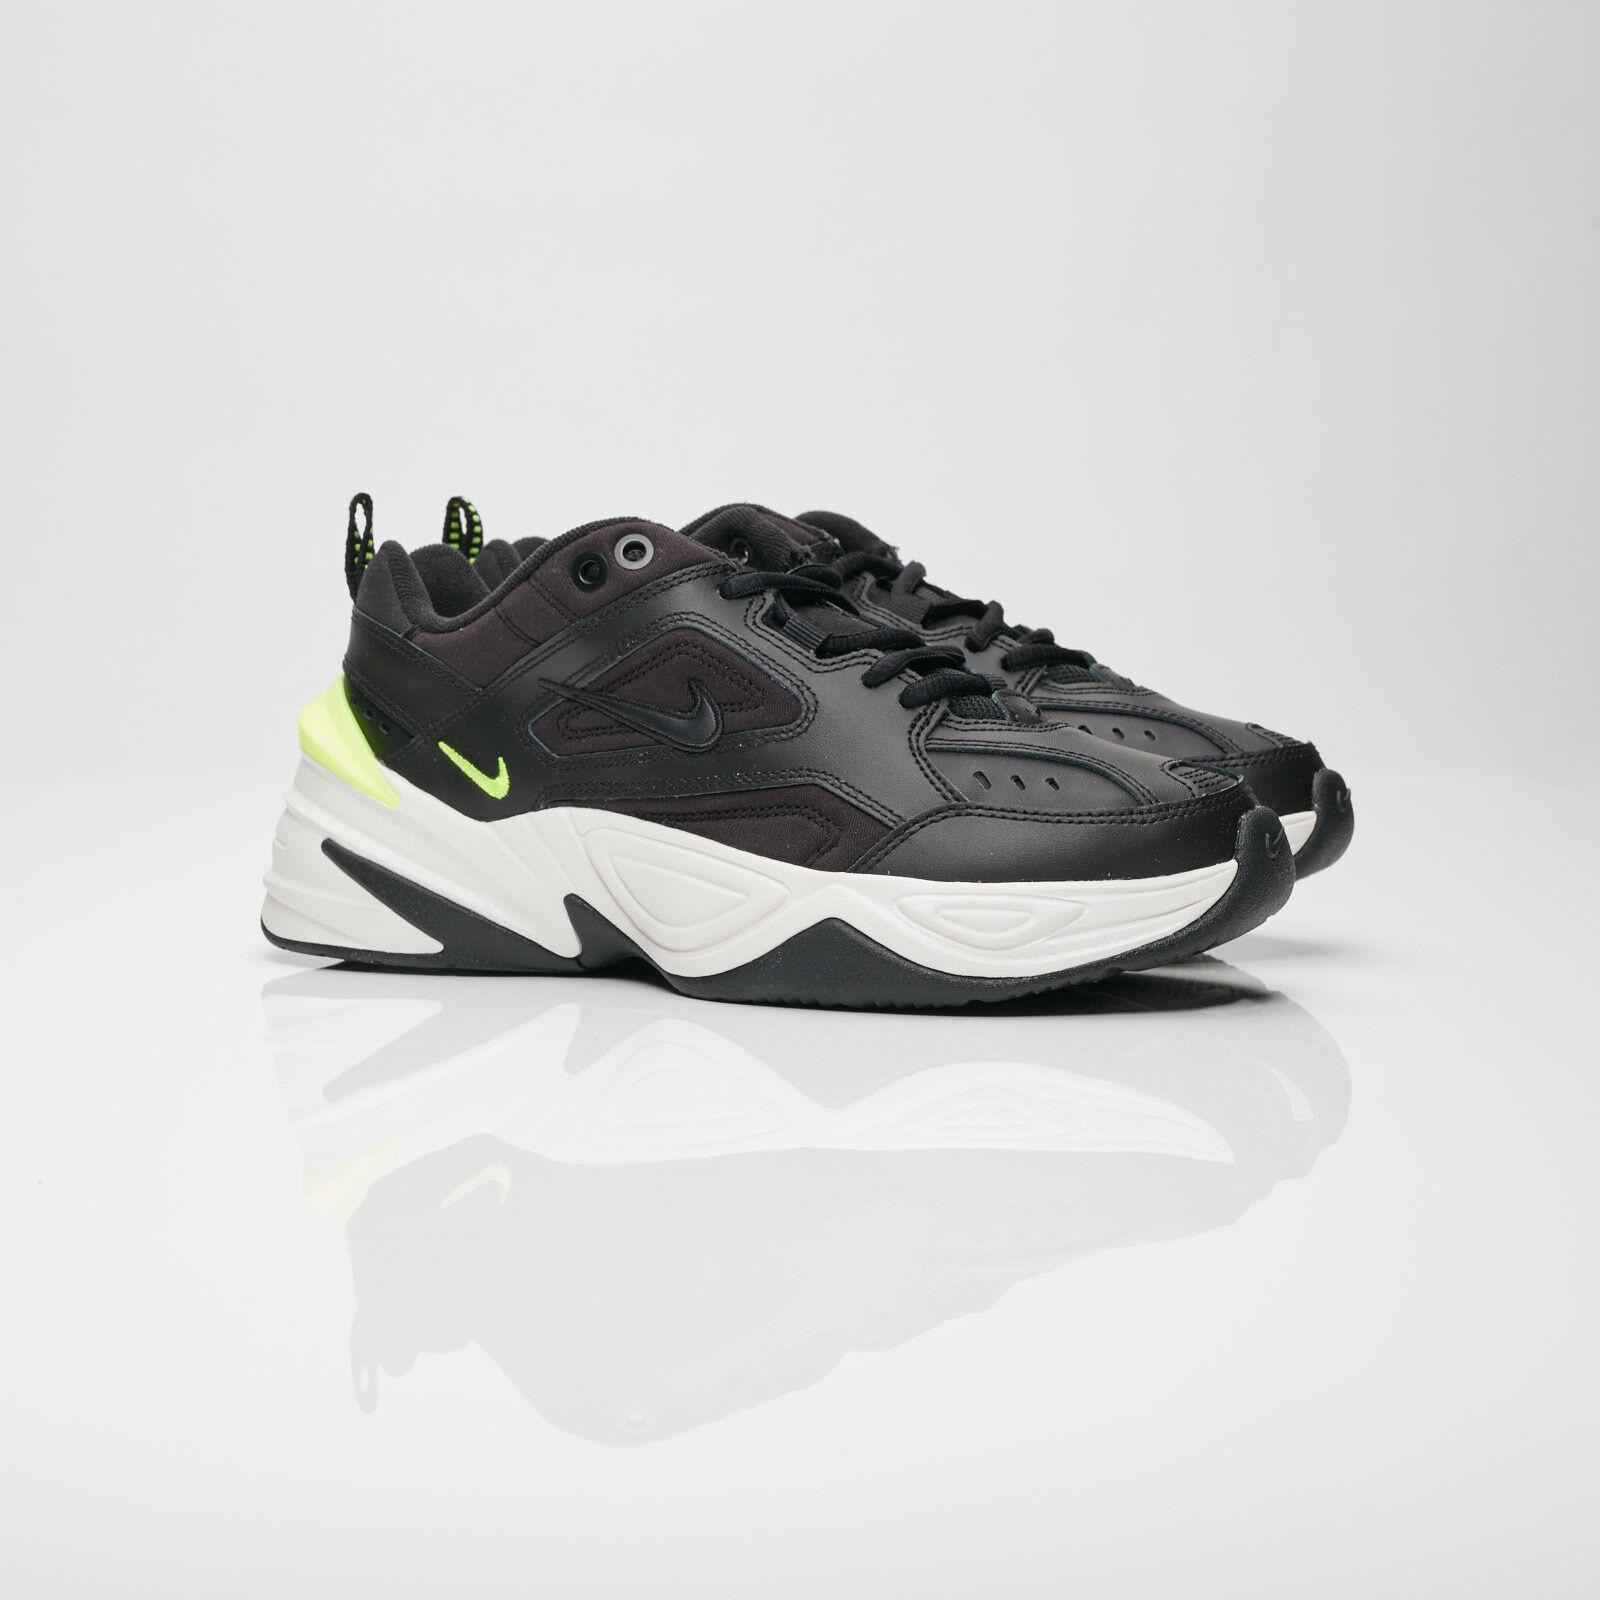 Nike M2K Tekno Phantom Volt AO3108-002 Women Sizes NEW 100% Authentic Limited